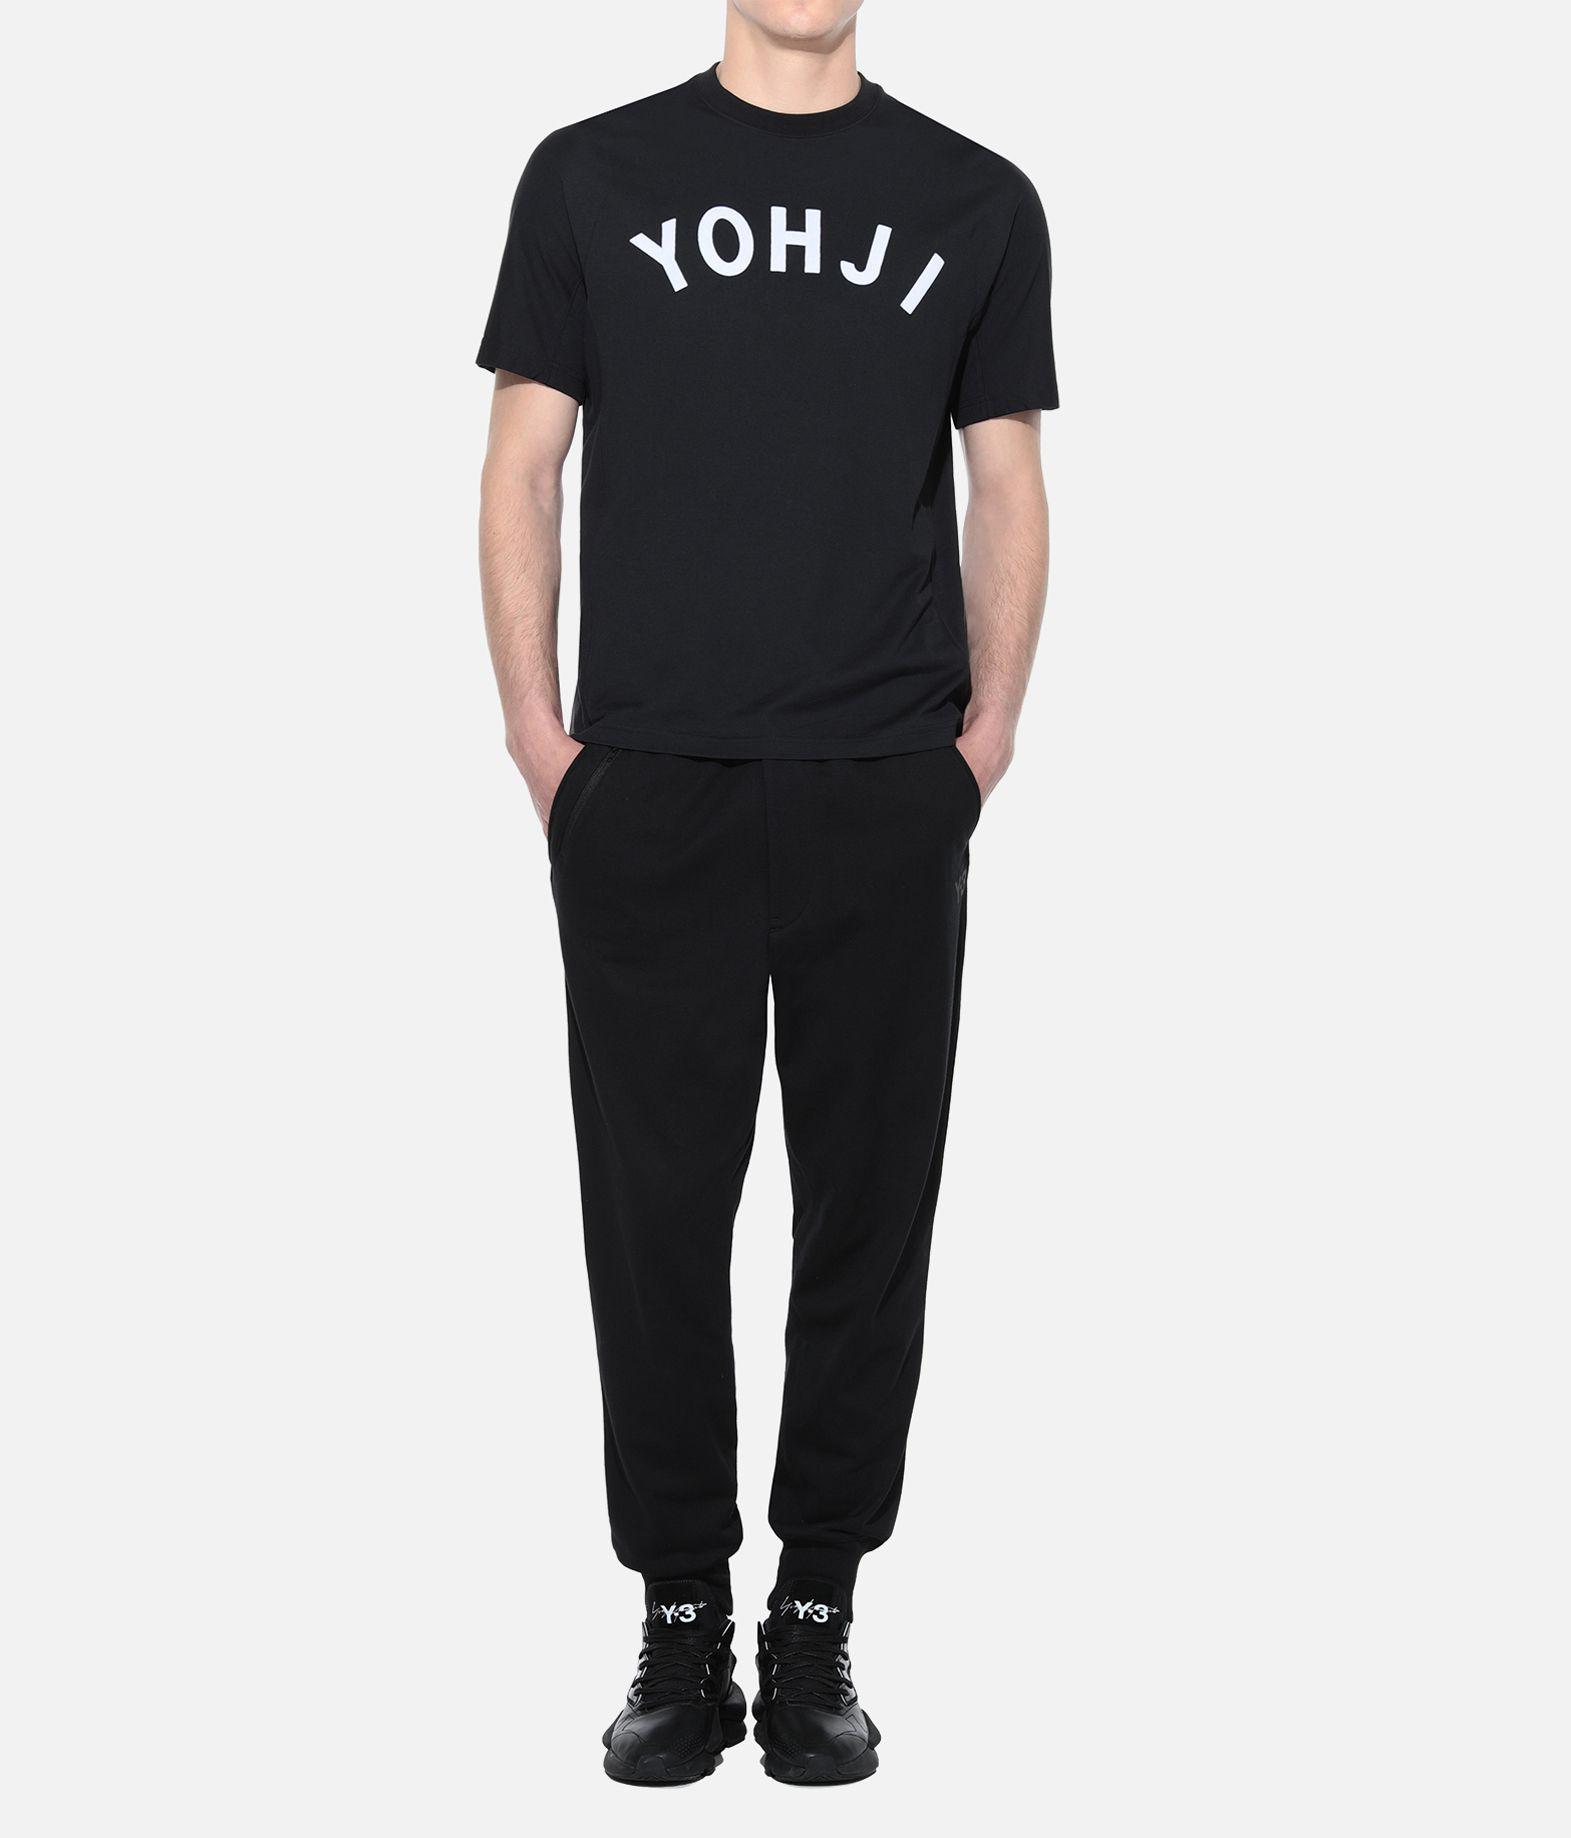 Y-3 Y-3 Yohji Letters Tee T-shirt maniche corte Uomo a